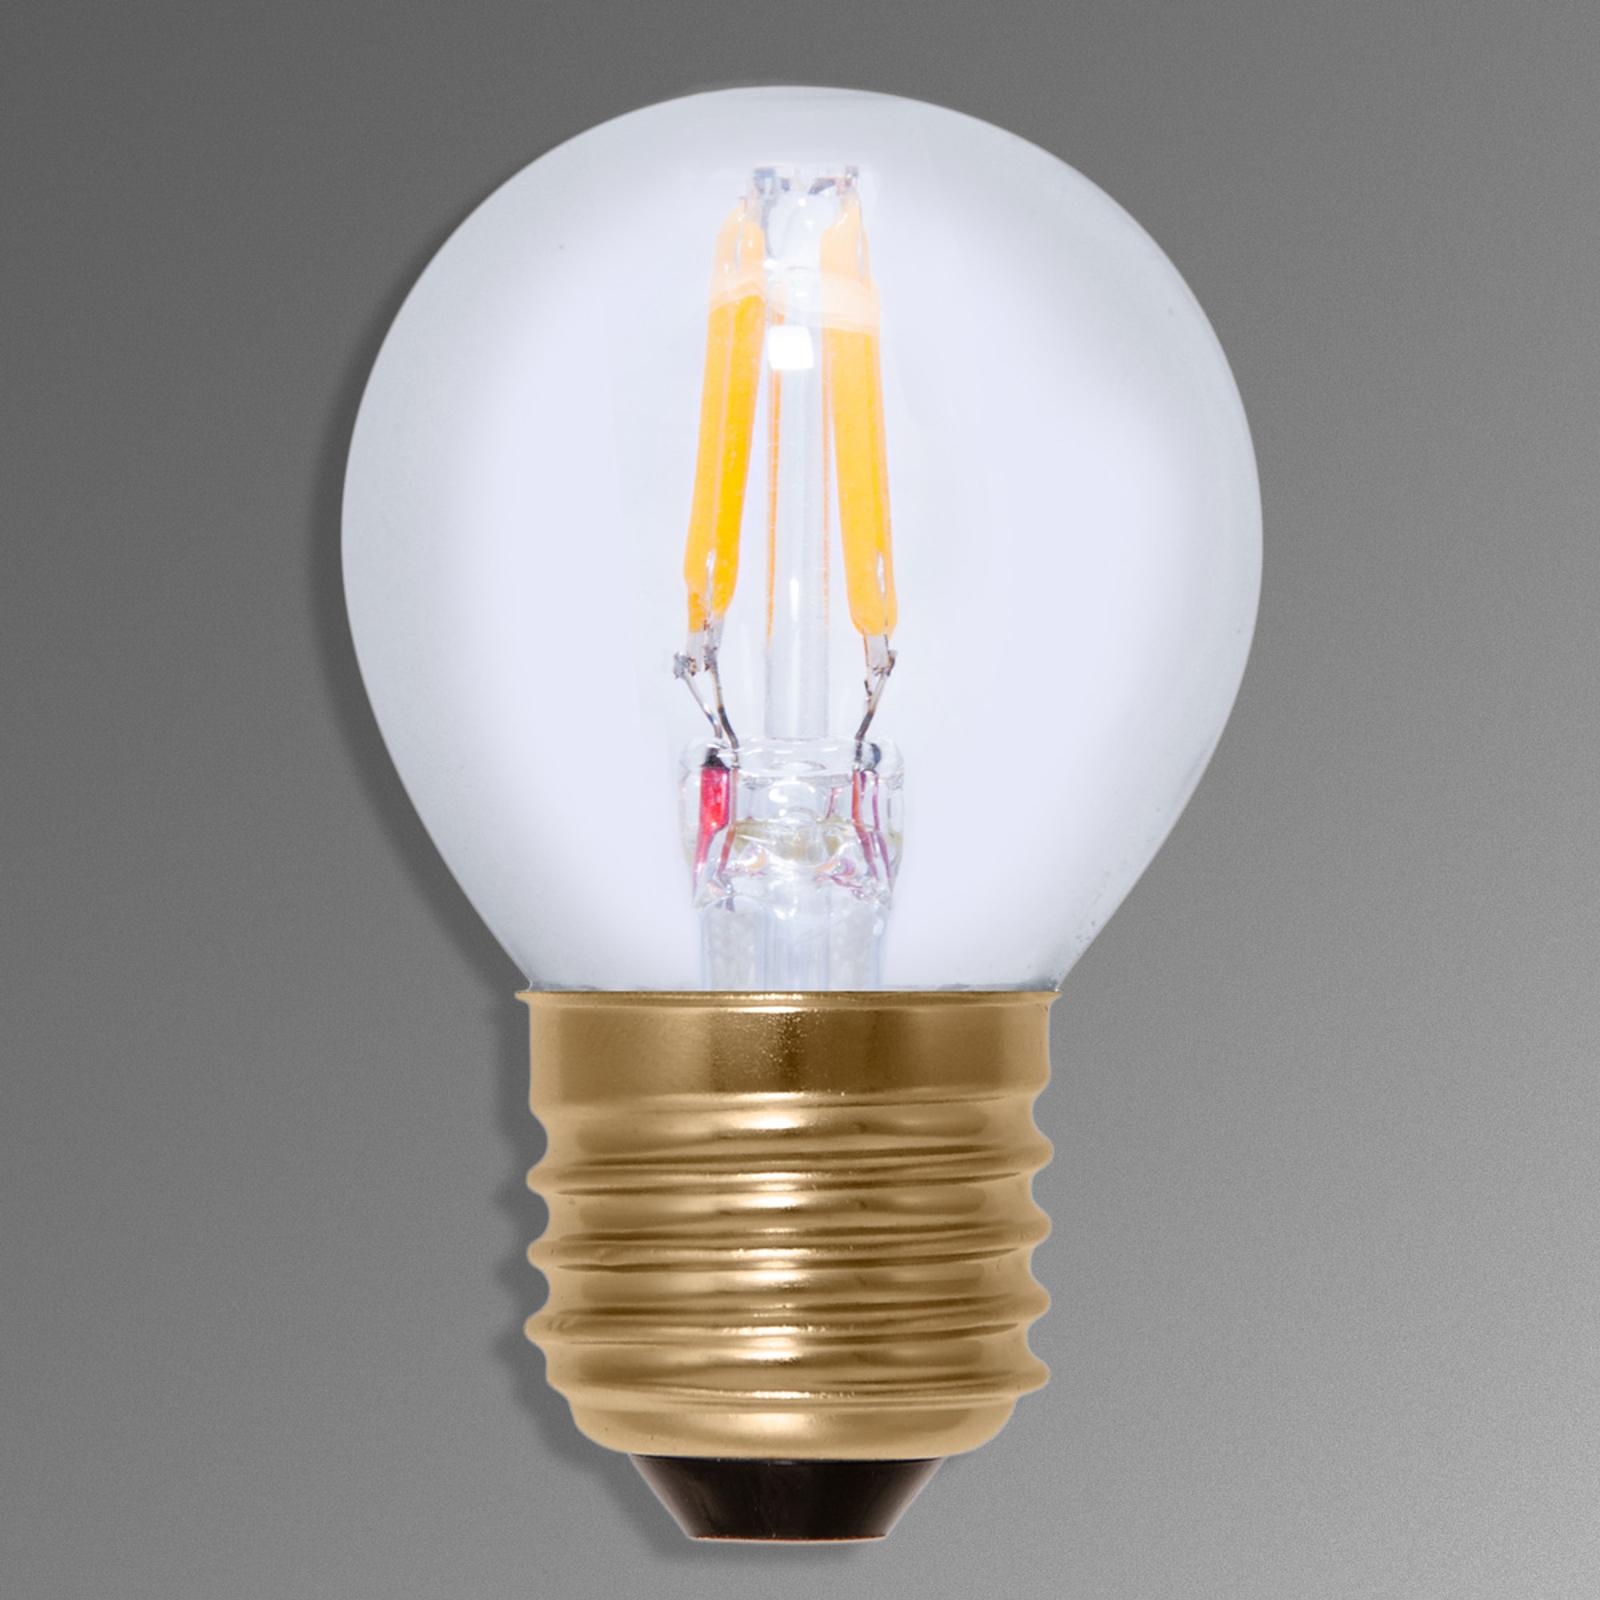 E27 2,7 W 922 LED dråpepære synlige glødetråder